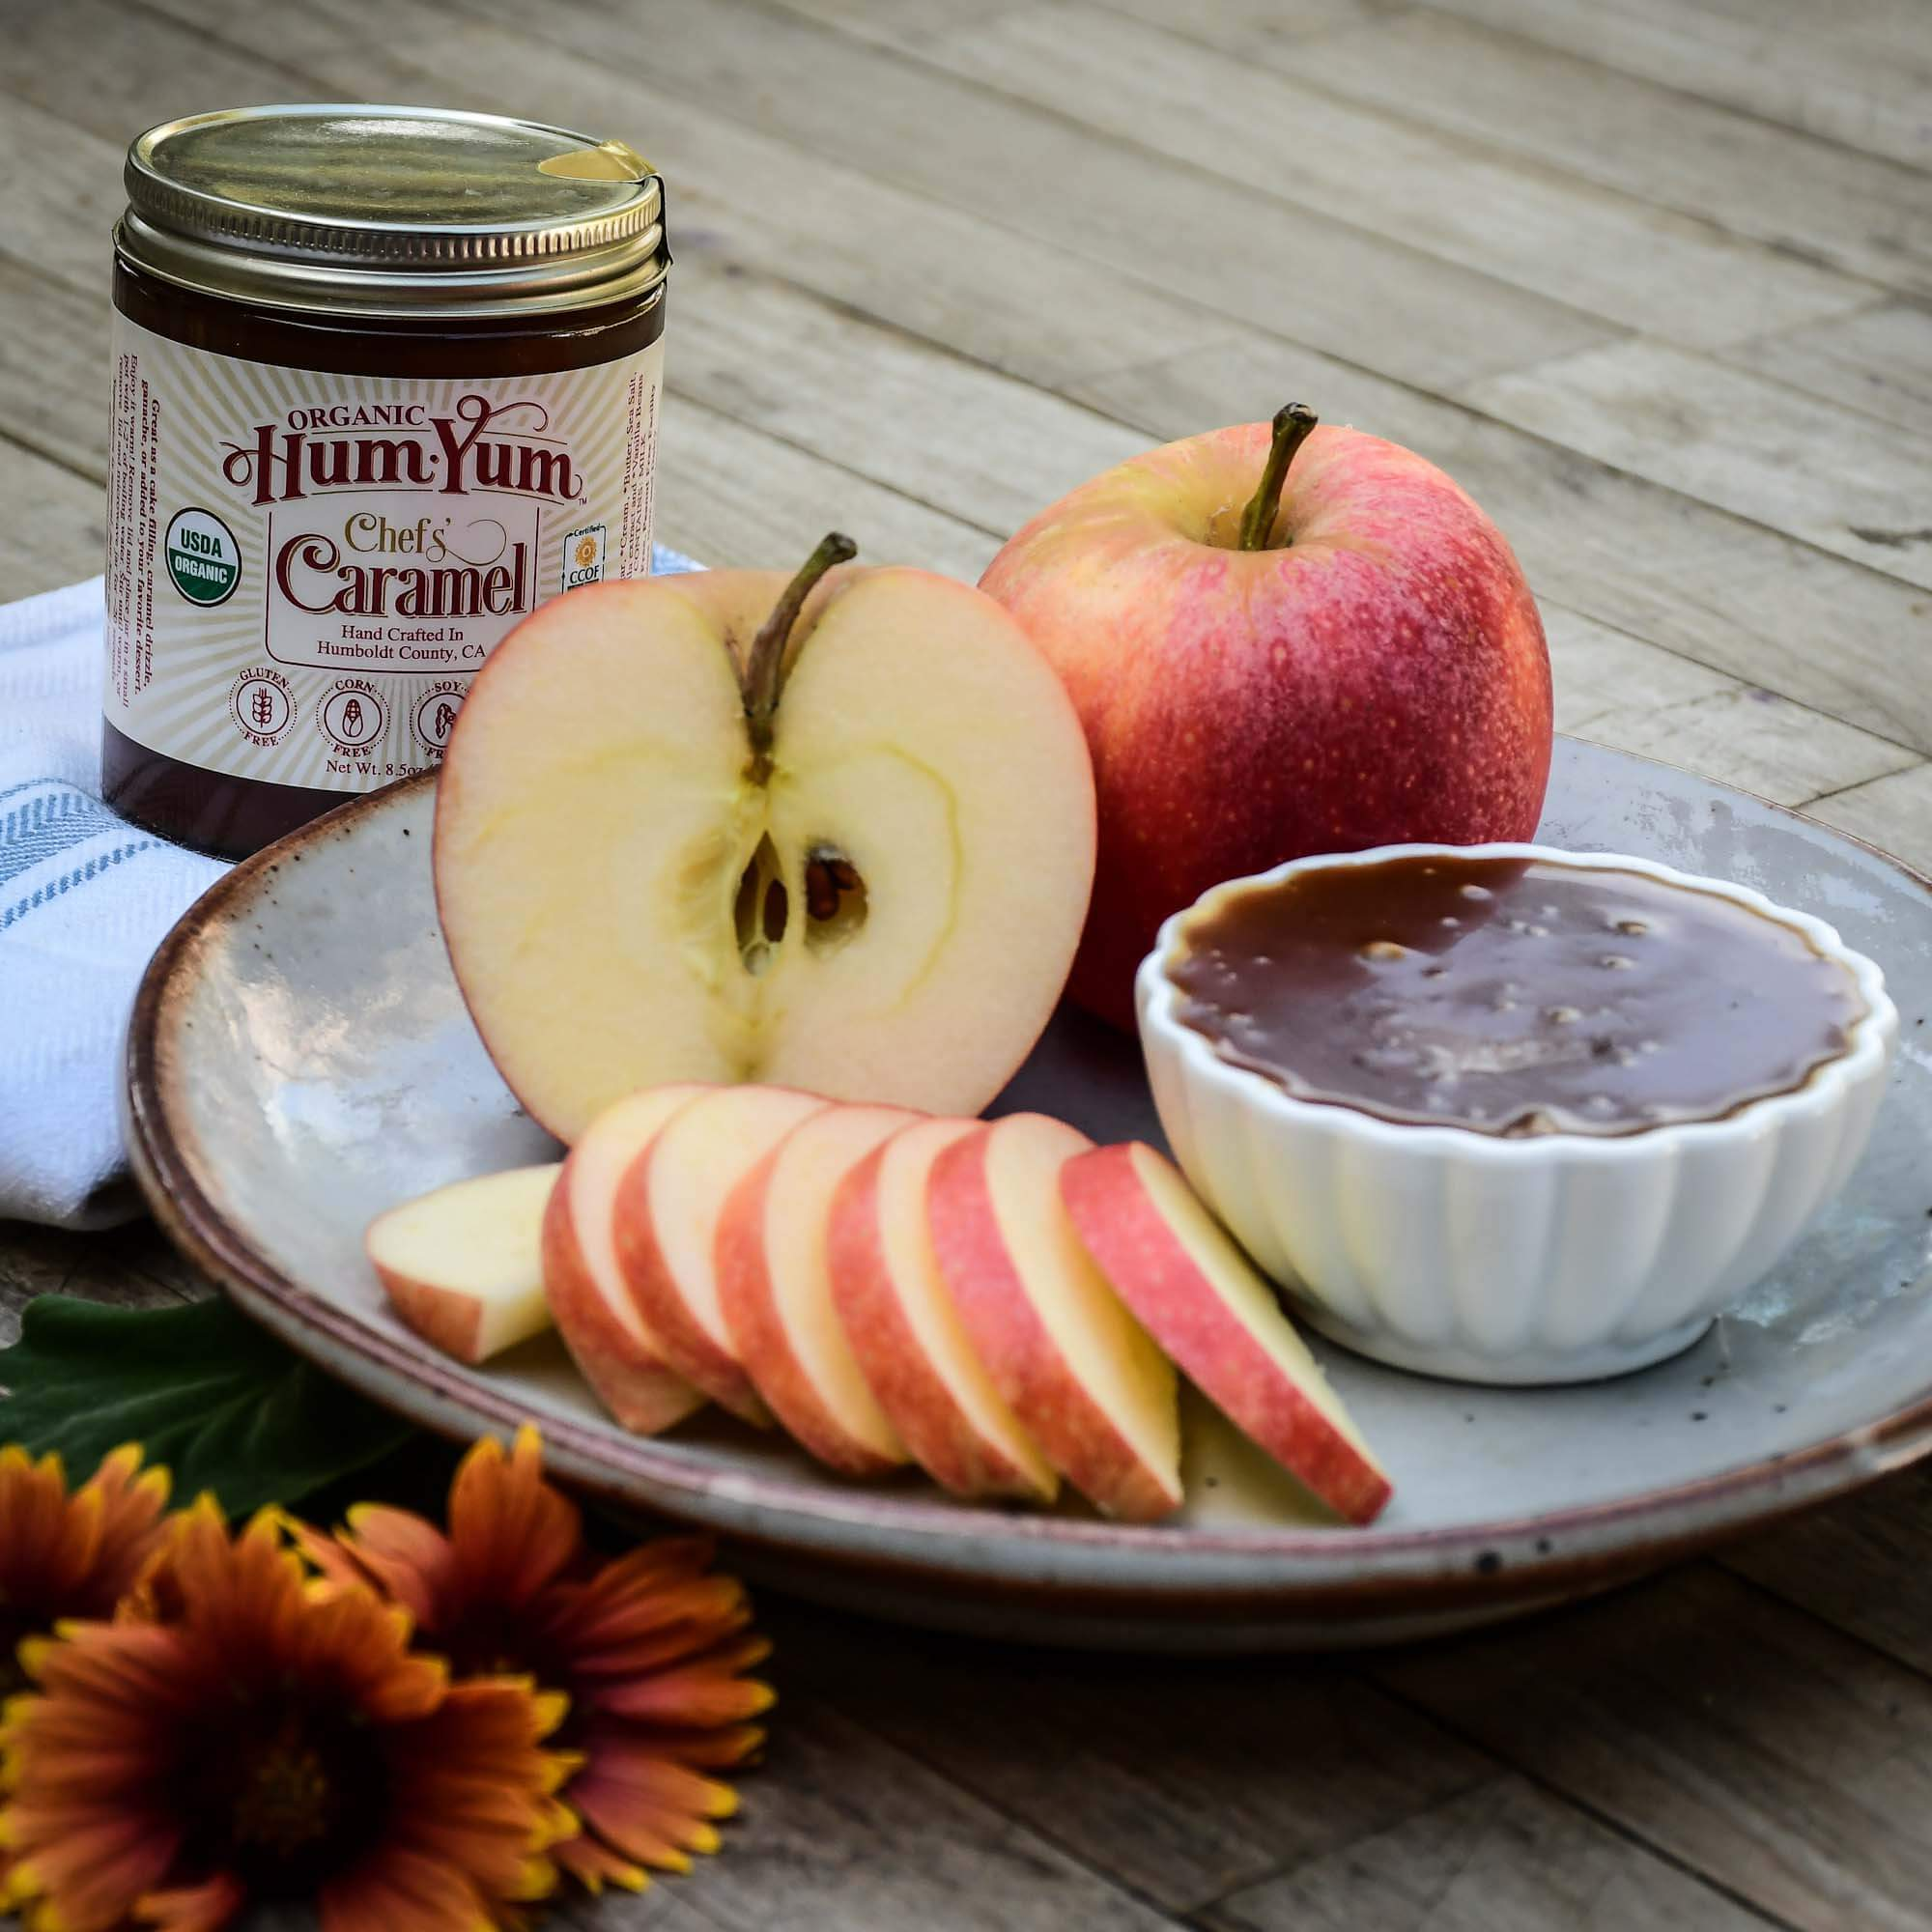 Apples & Caramel Box